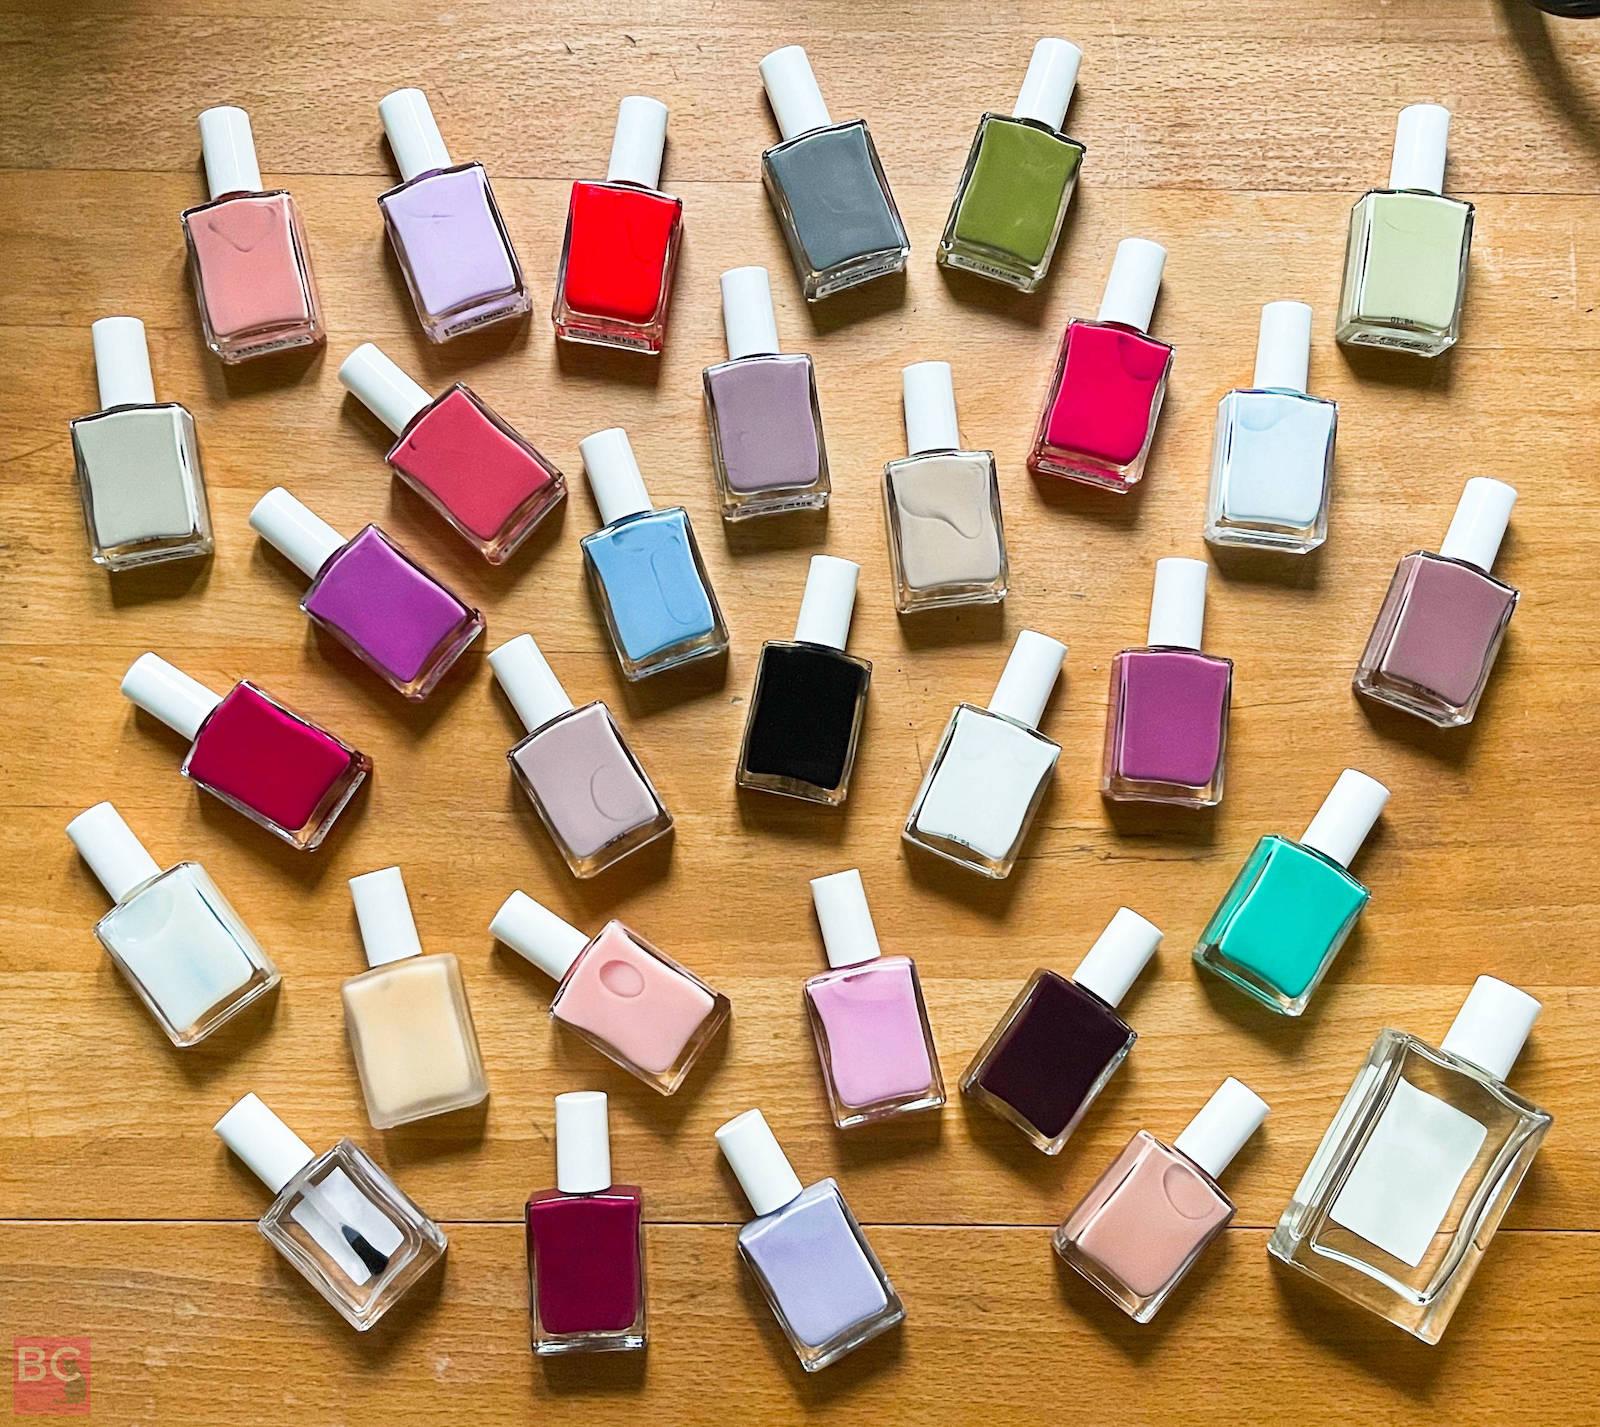 Gitti Nagellack Erfahrungen Farben Auswahl